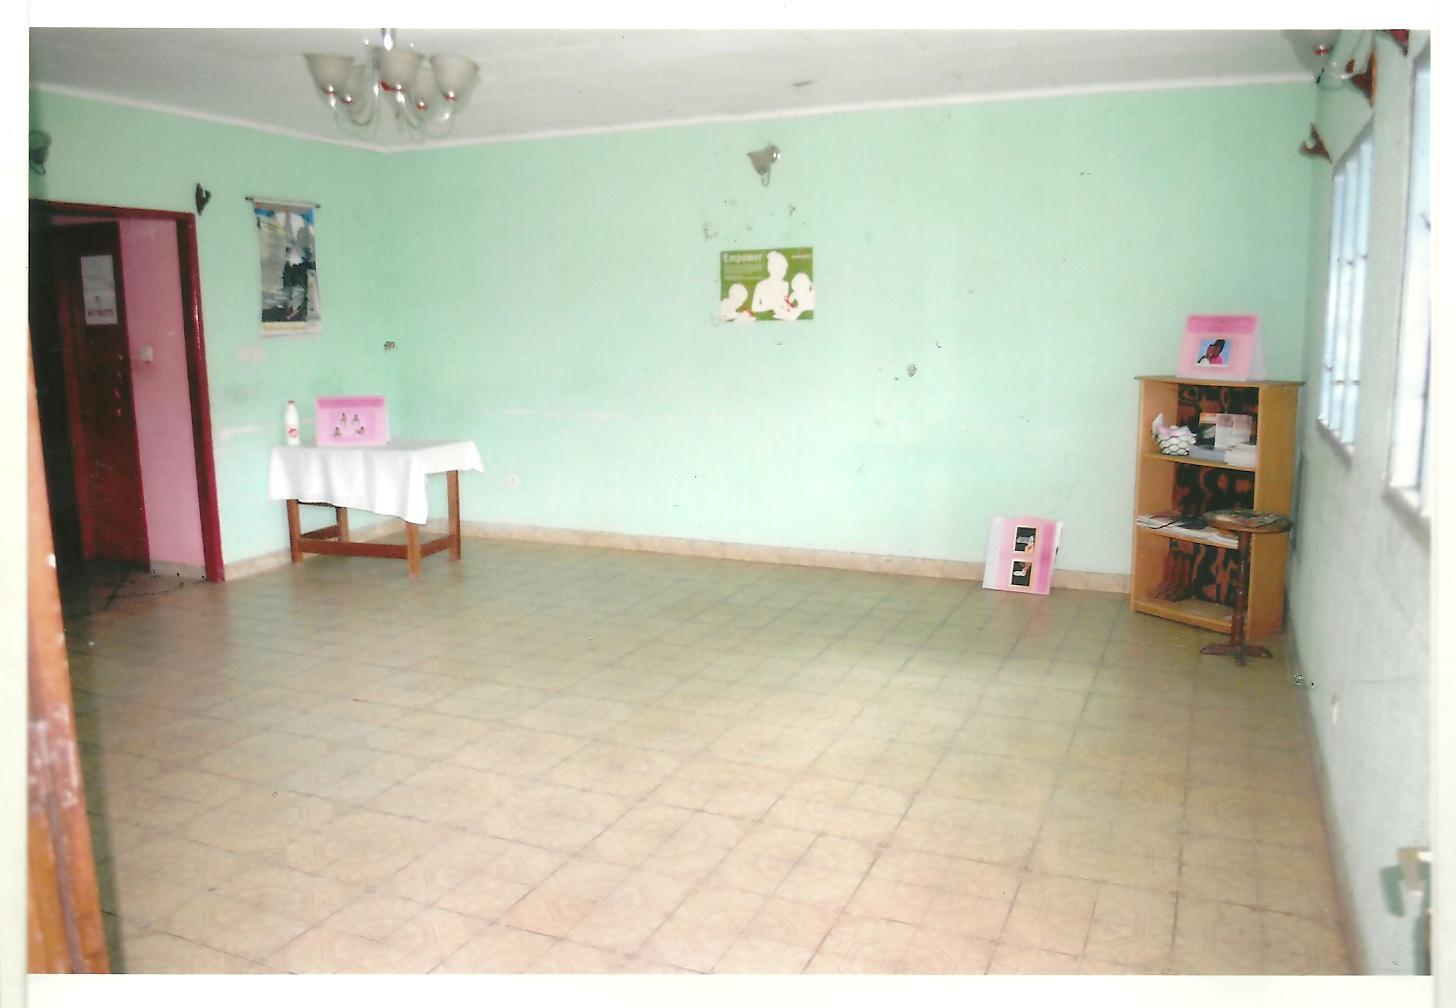 Room emptied, inside the Center on November 23, 2014 (by Adonis Tchoudja)